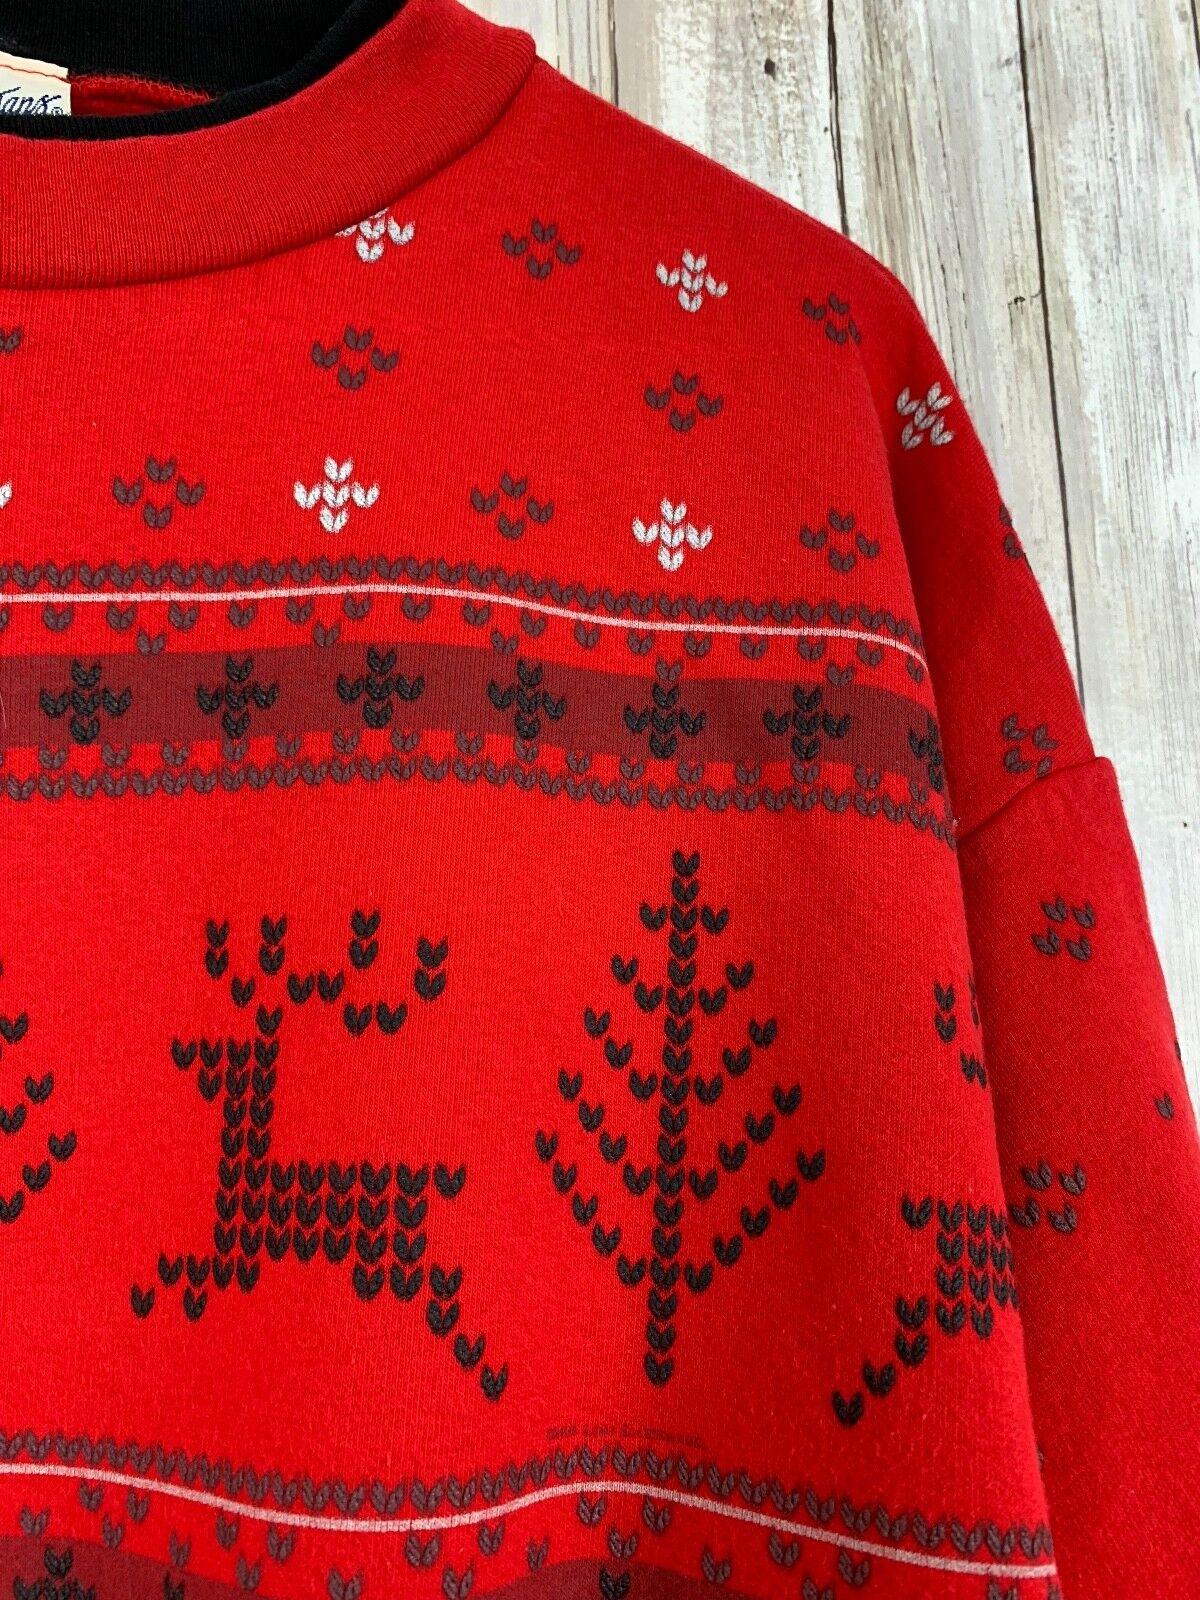 Artisans Print Embroidered Ugly Christmas Deer Is… - image 3